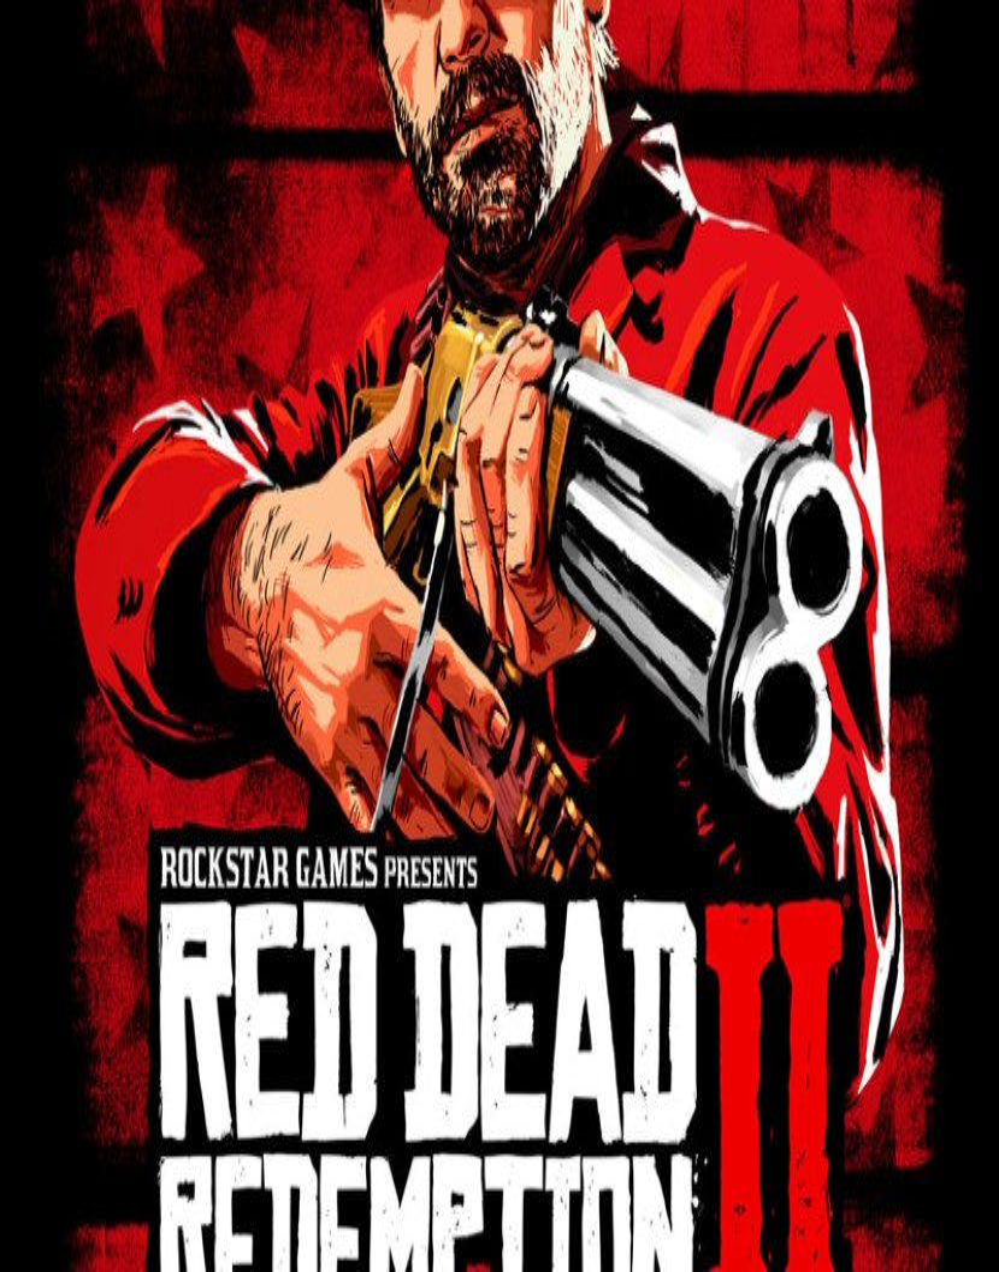 Red Dead Redemption 2: Έρχεται για Stadia και Windows PC στις 5 Νοεμβρίου!